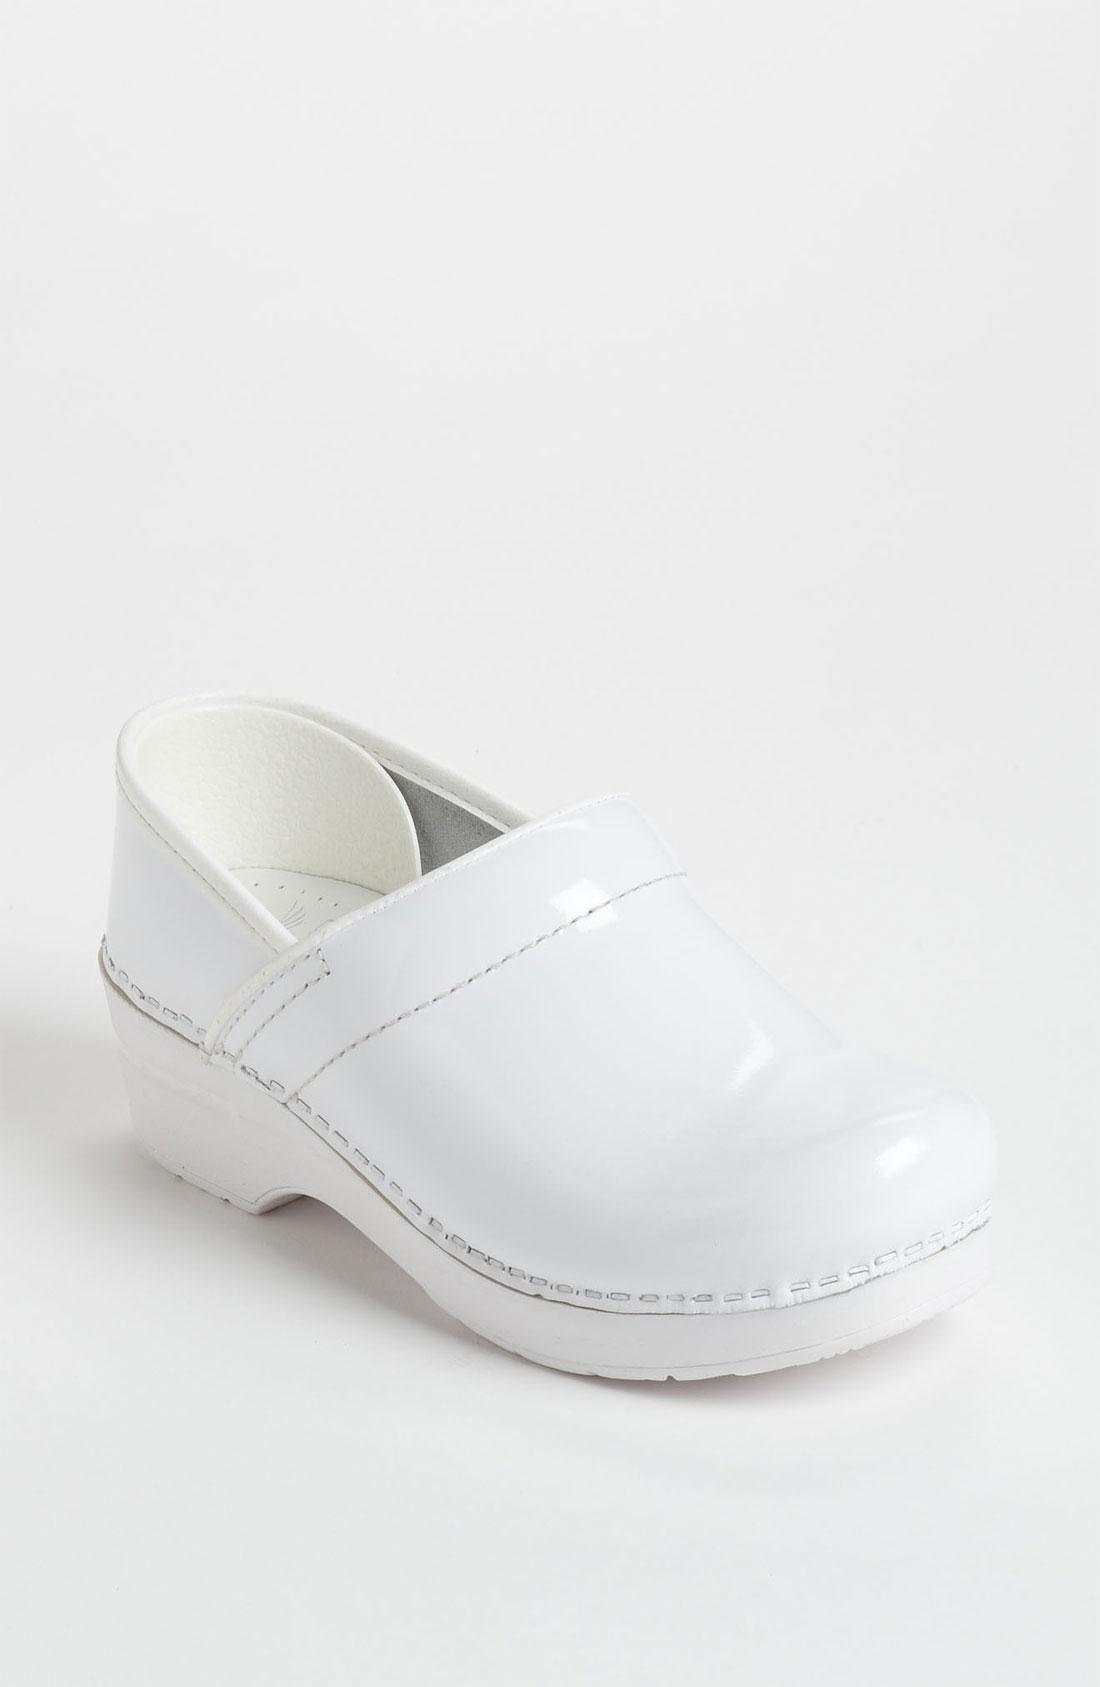 Dansko Professional Clog In White White Patent Lyst